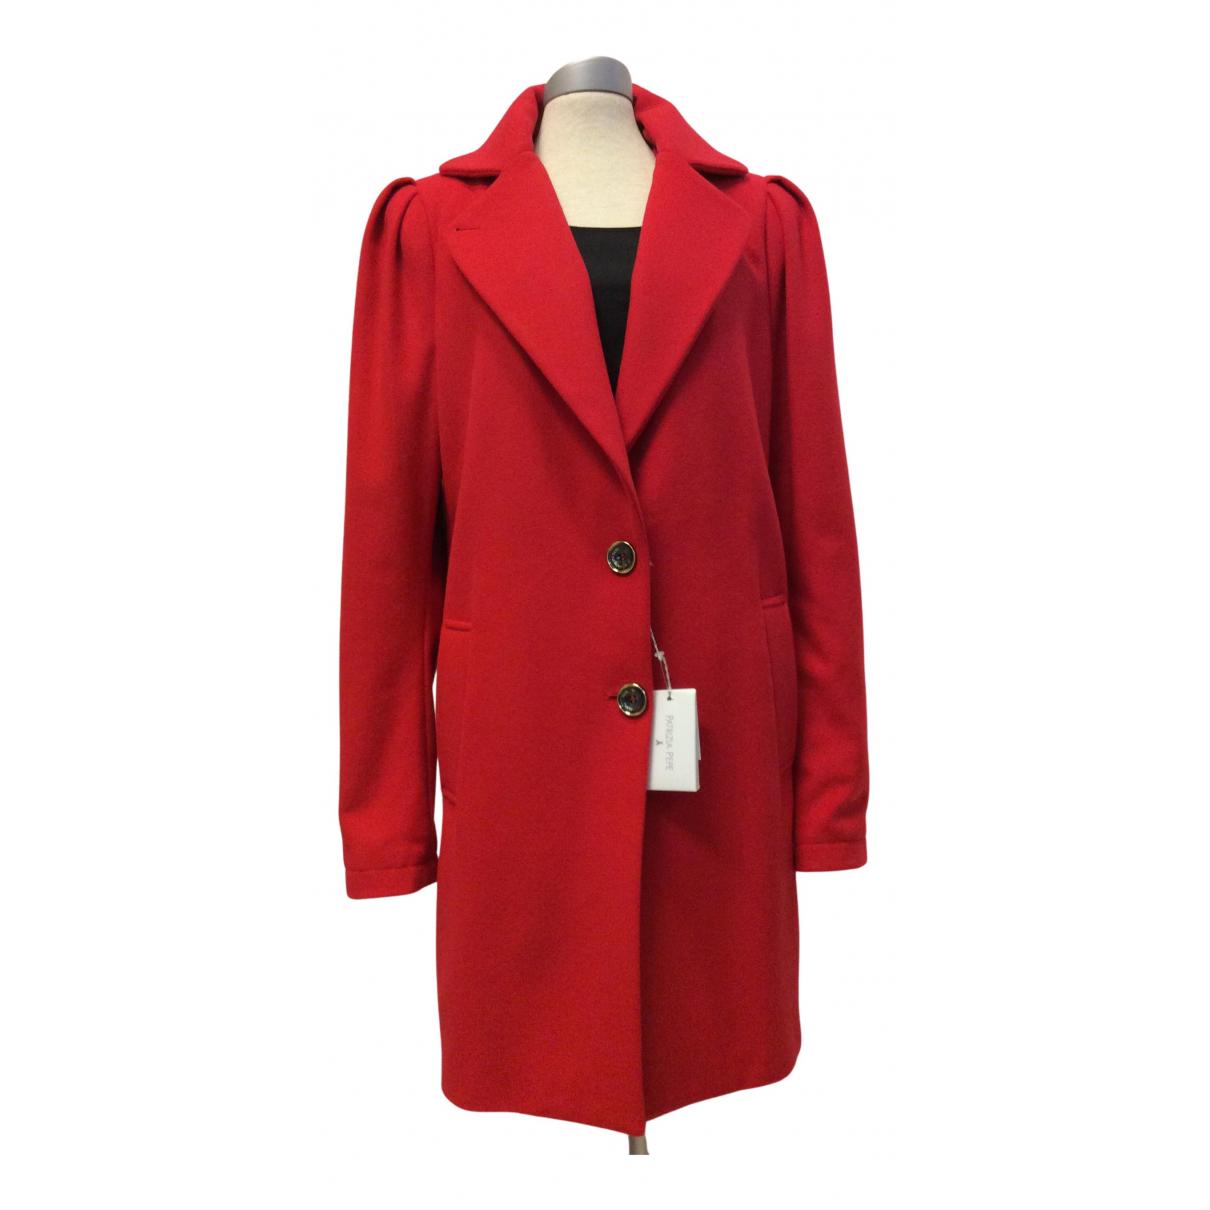 Patrizia Pepe \N Maentel in  Rot Wolle